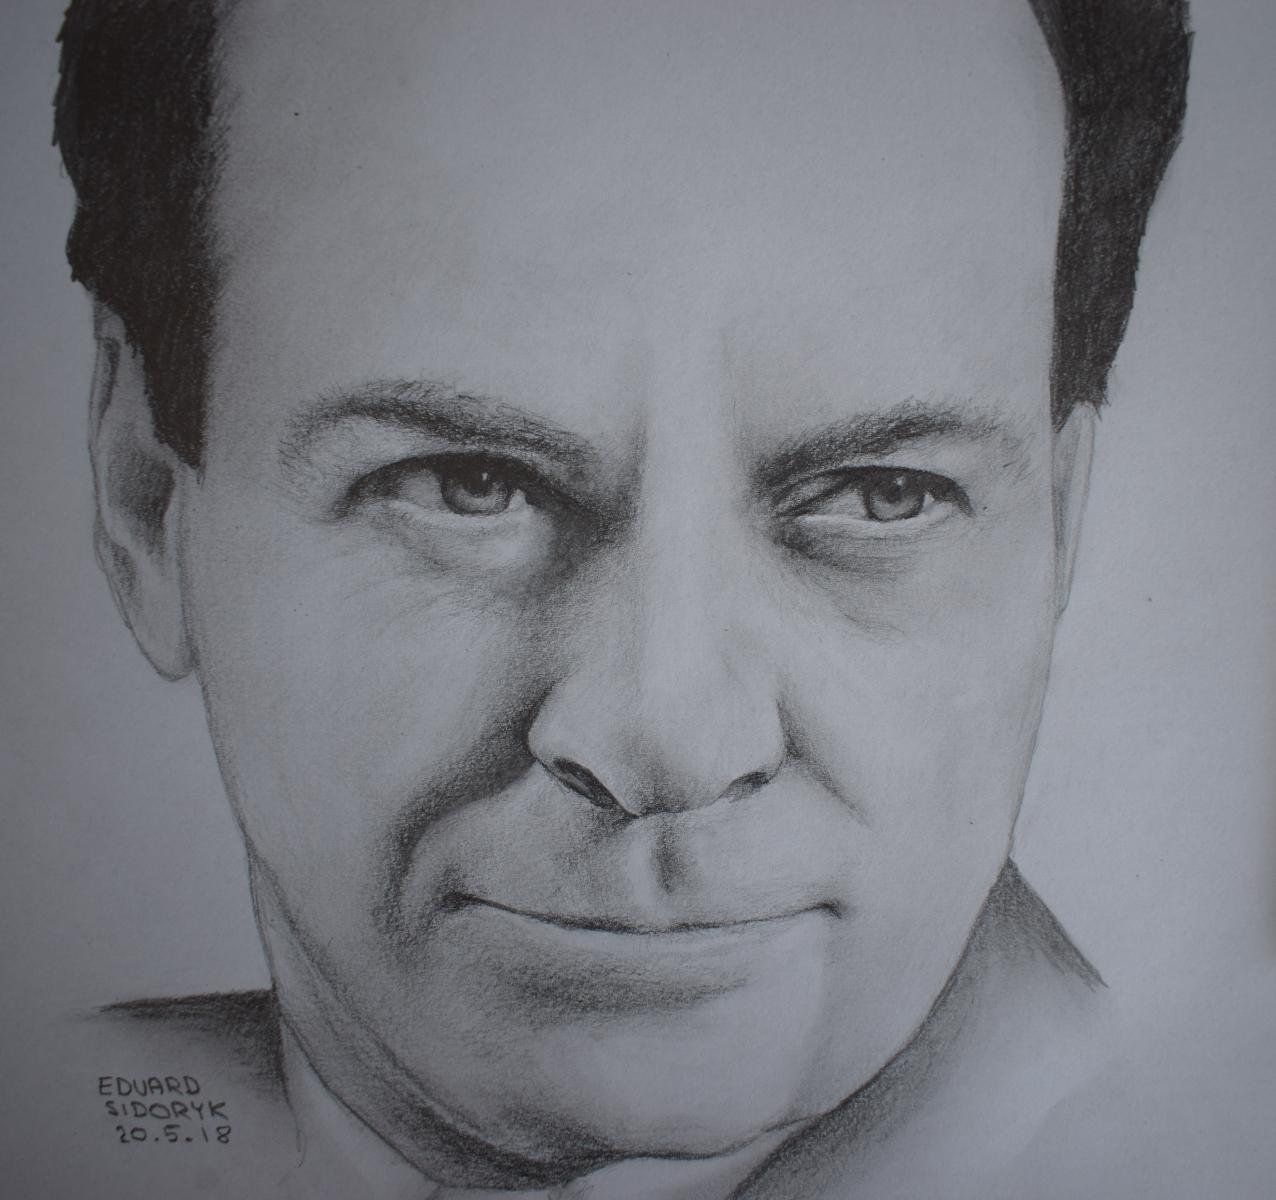 Richard Feynman, pencil drawing portrait by Krema-ART